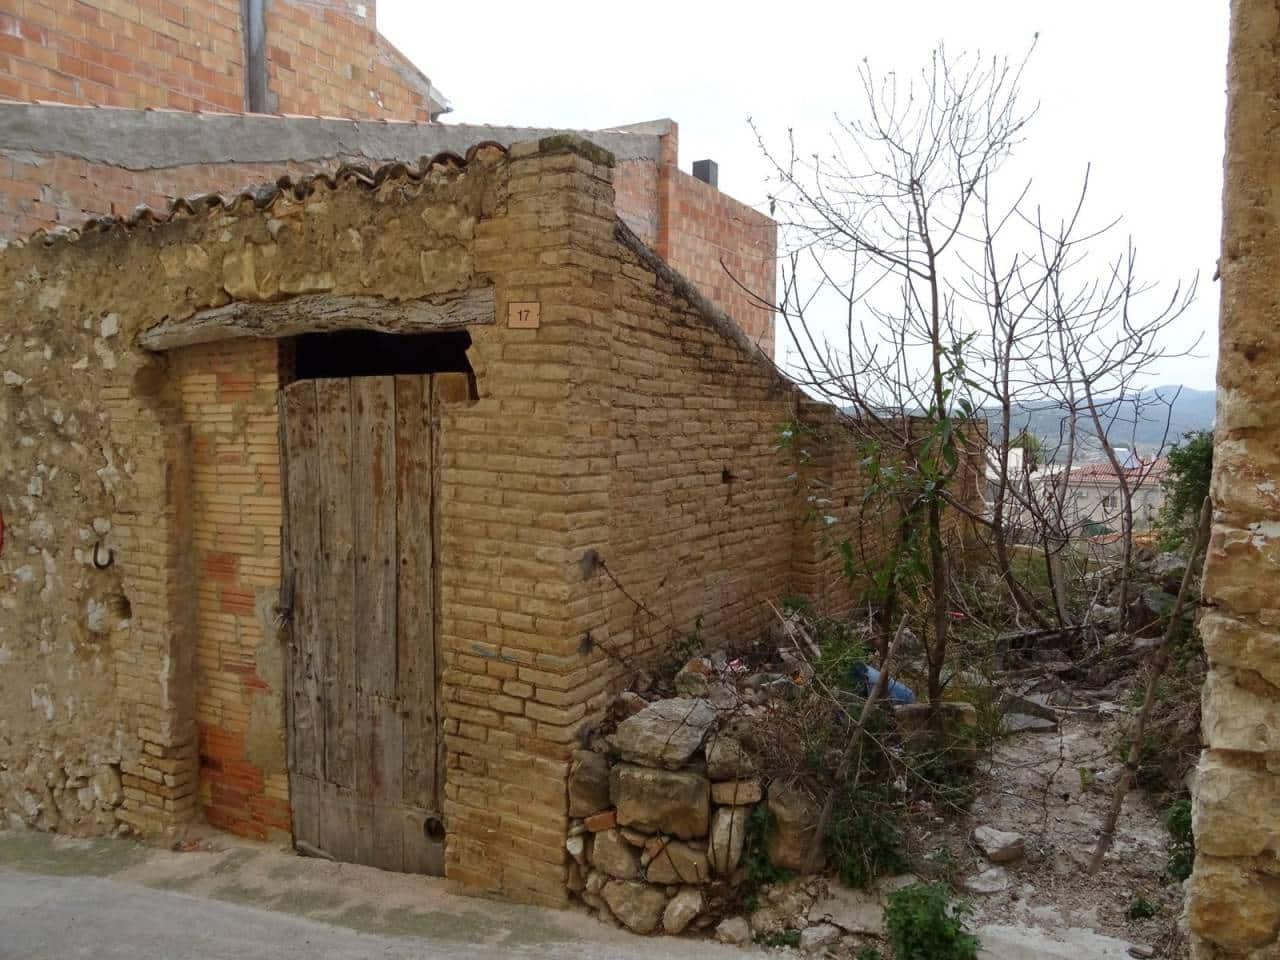 Comercial para venda em El Pinell de Brai - 10 000 € (Ref: 3776388)